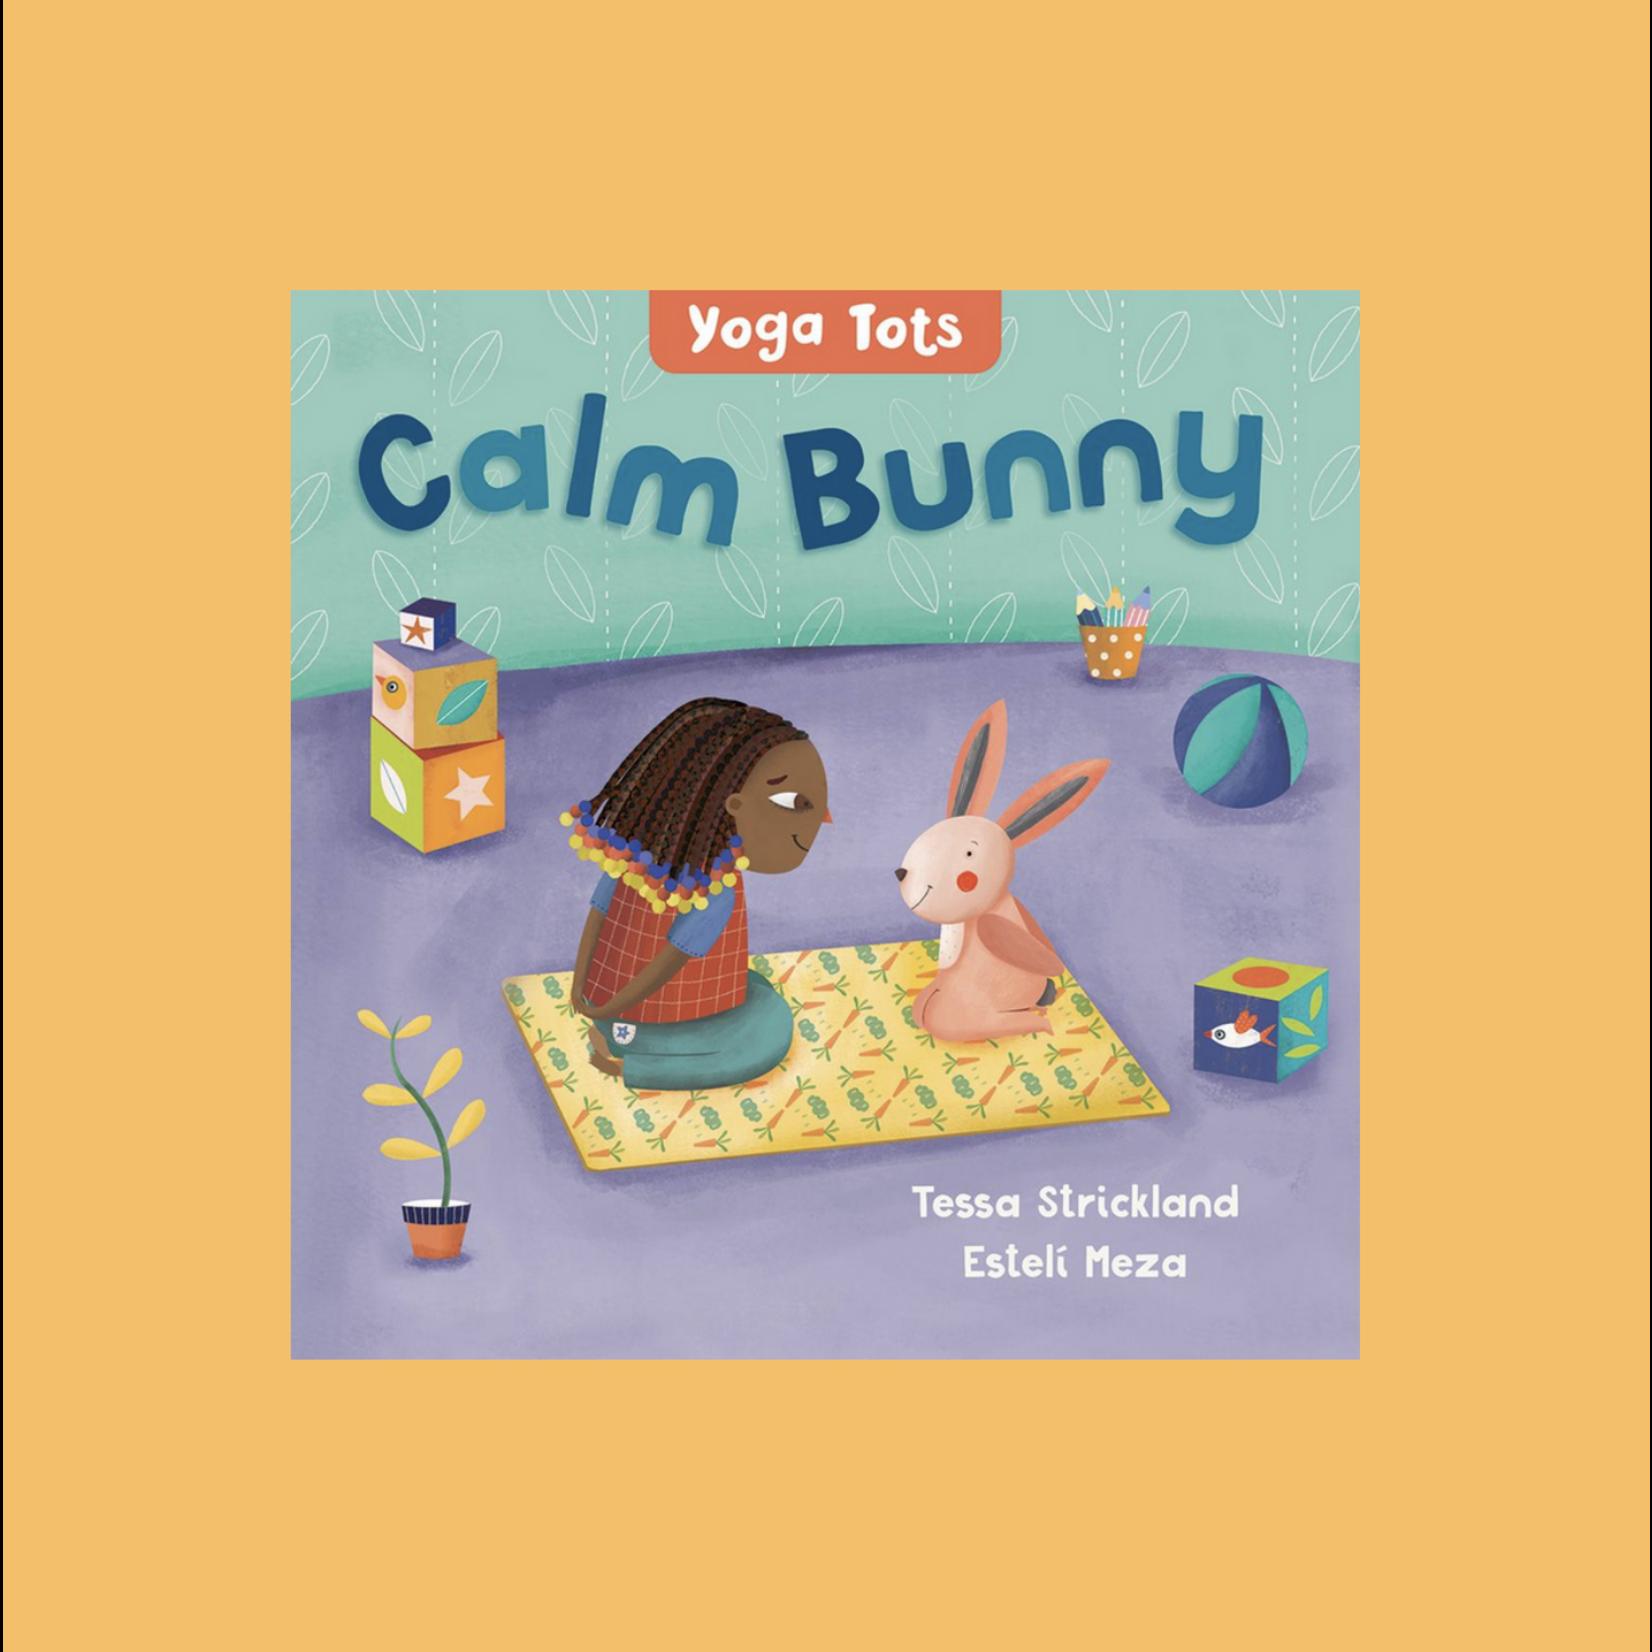 Yoga Tots: Calm Bunny Board Book - Tessa Strickland